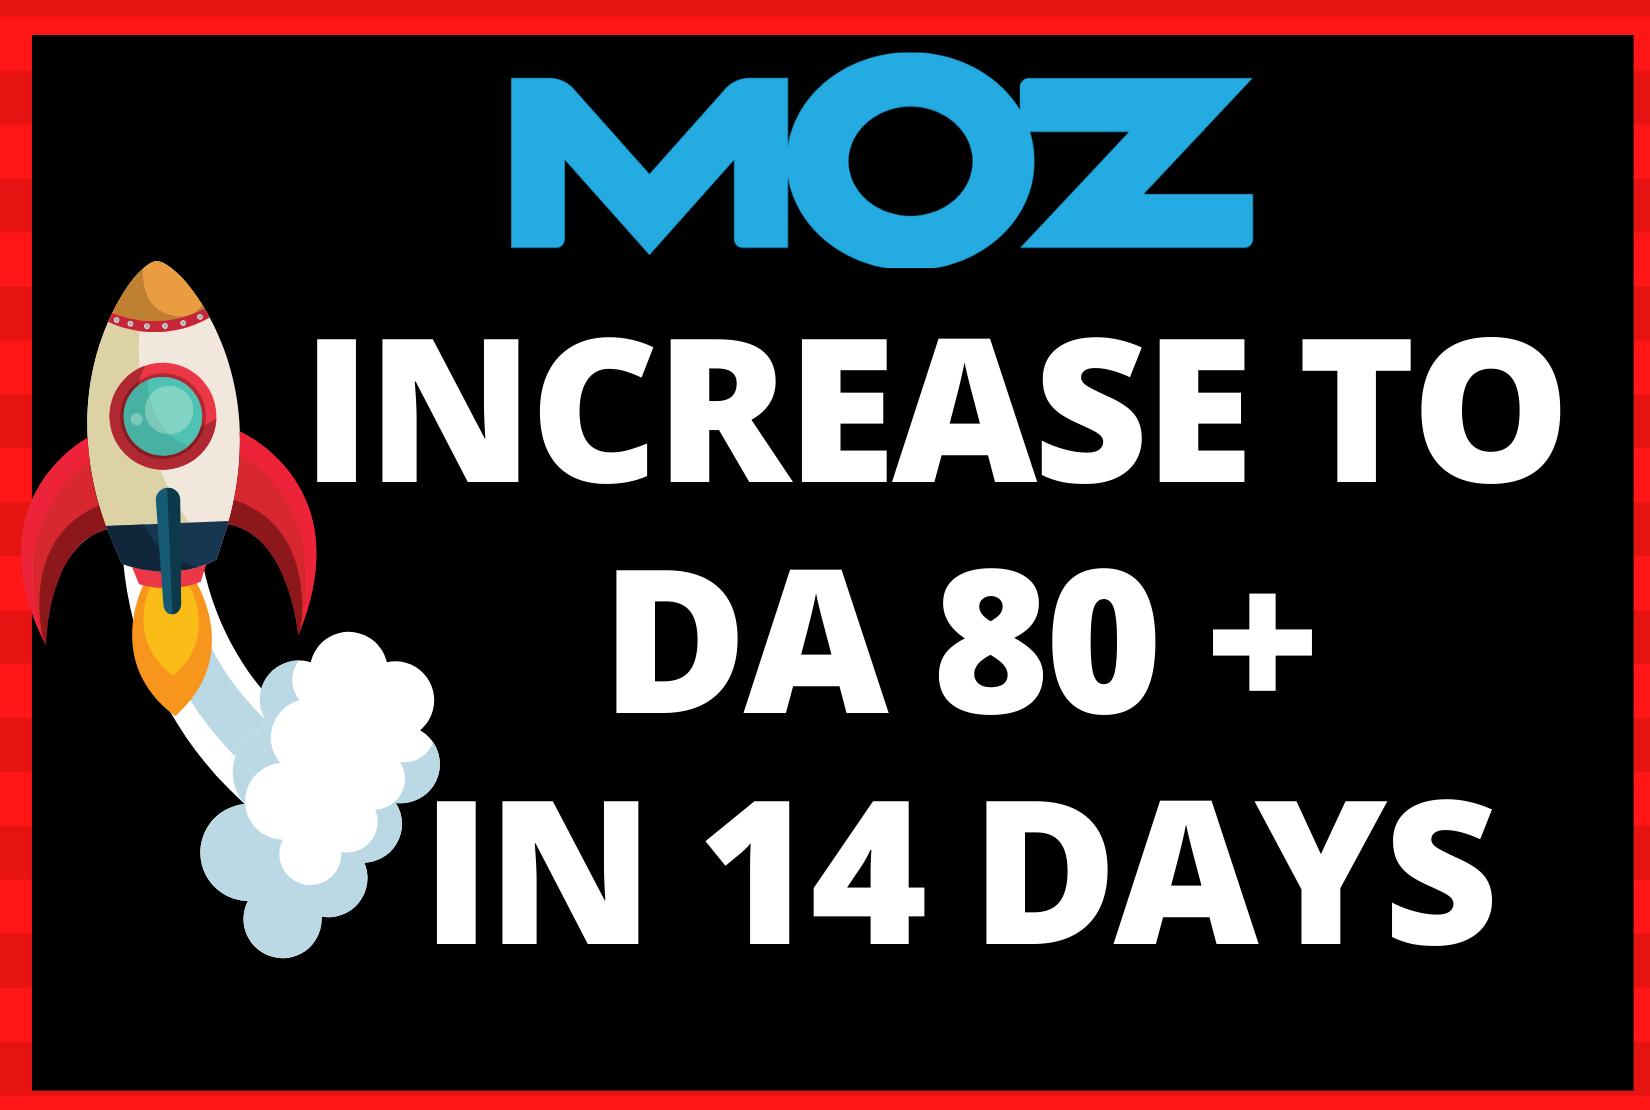 Skyrocket DA 80+ - Moz Domain Authority Boost